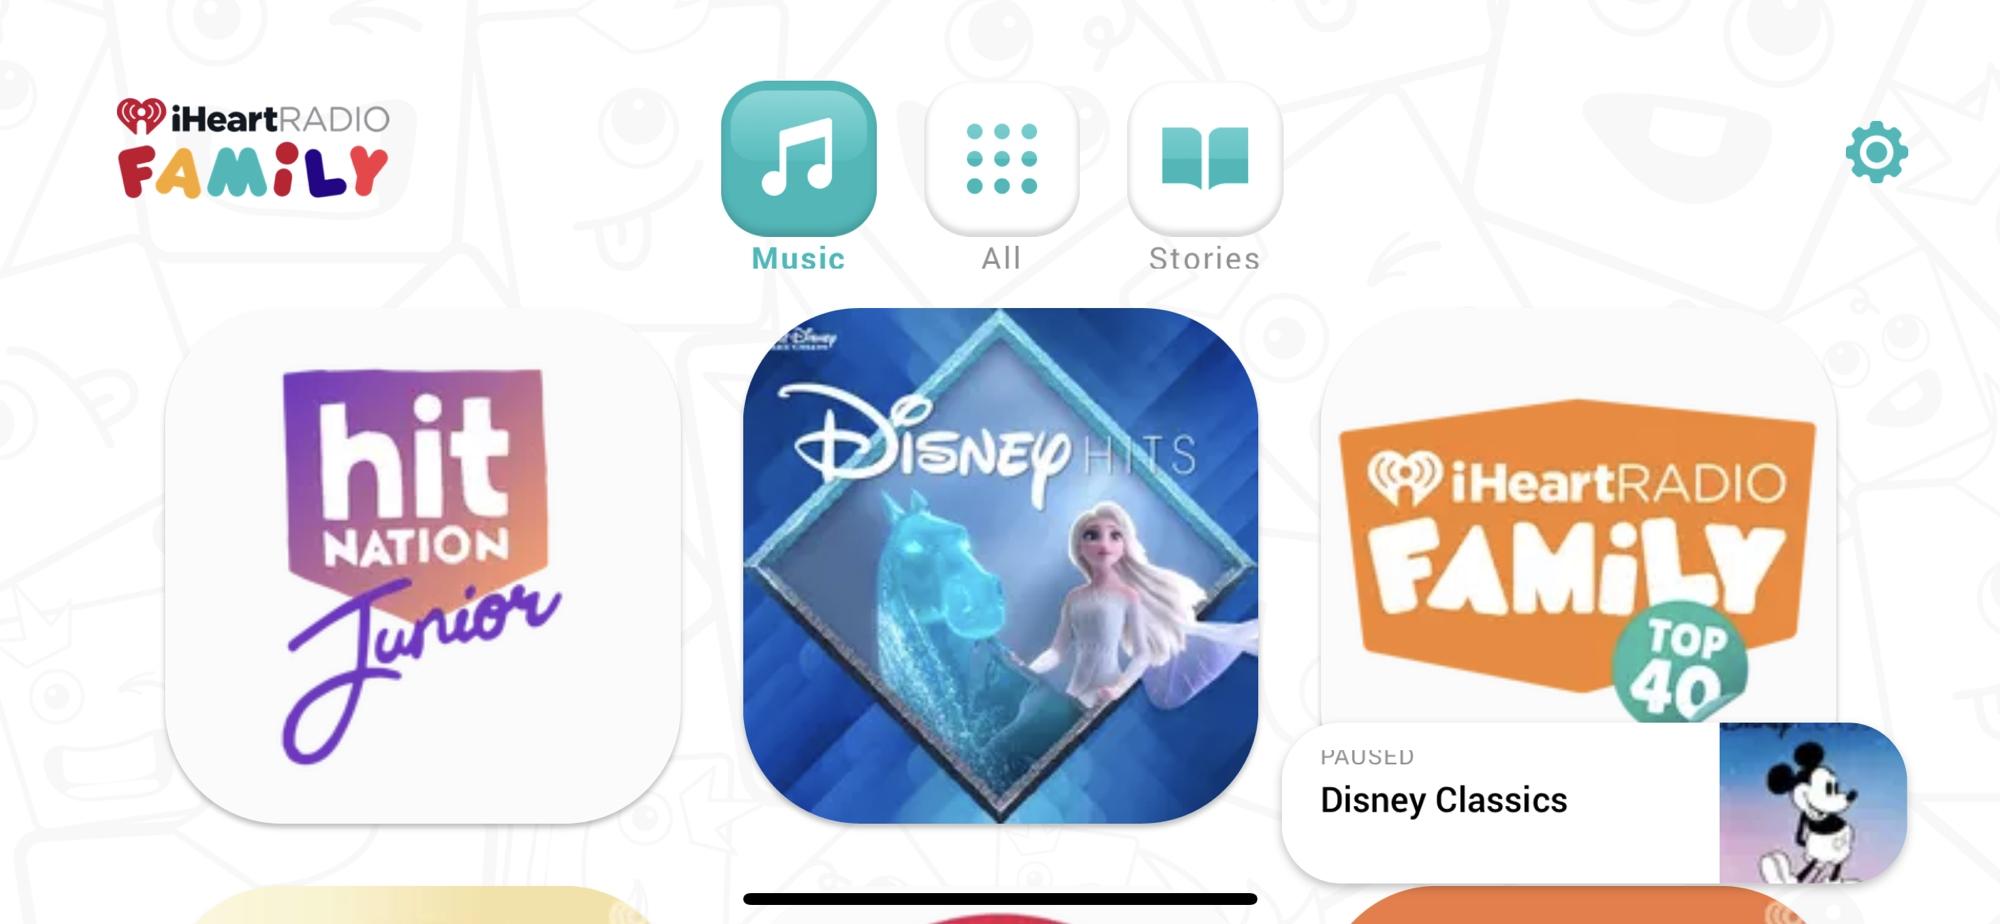 iHeart Radio Family Music on iPhone